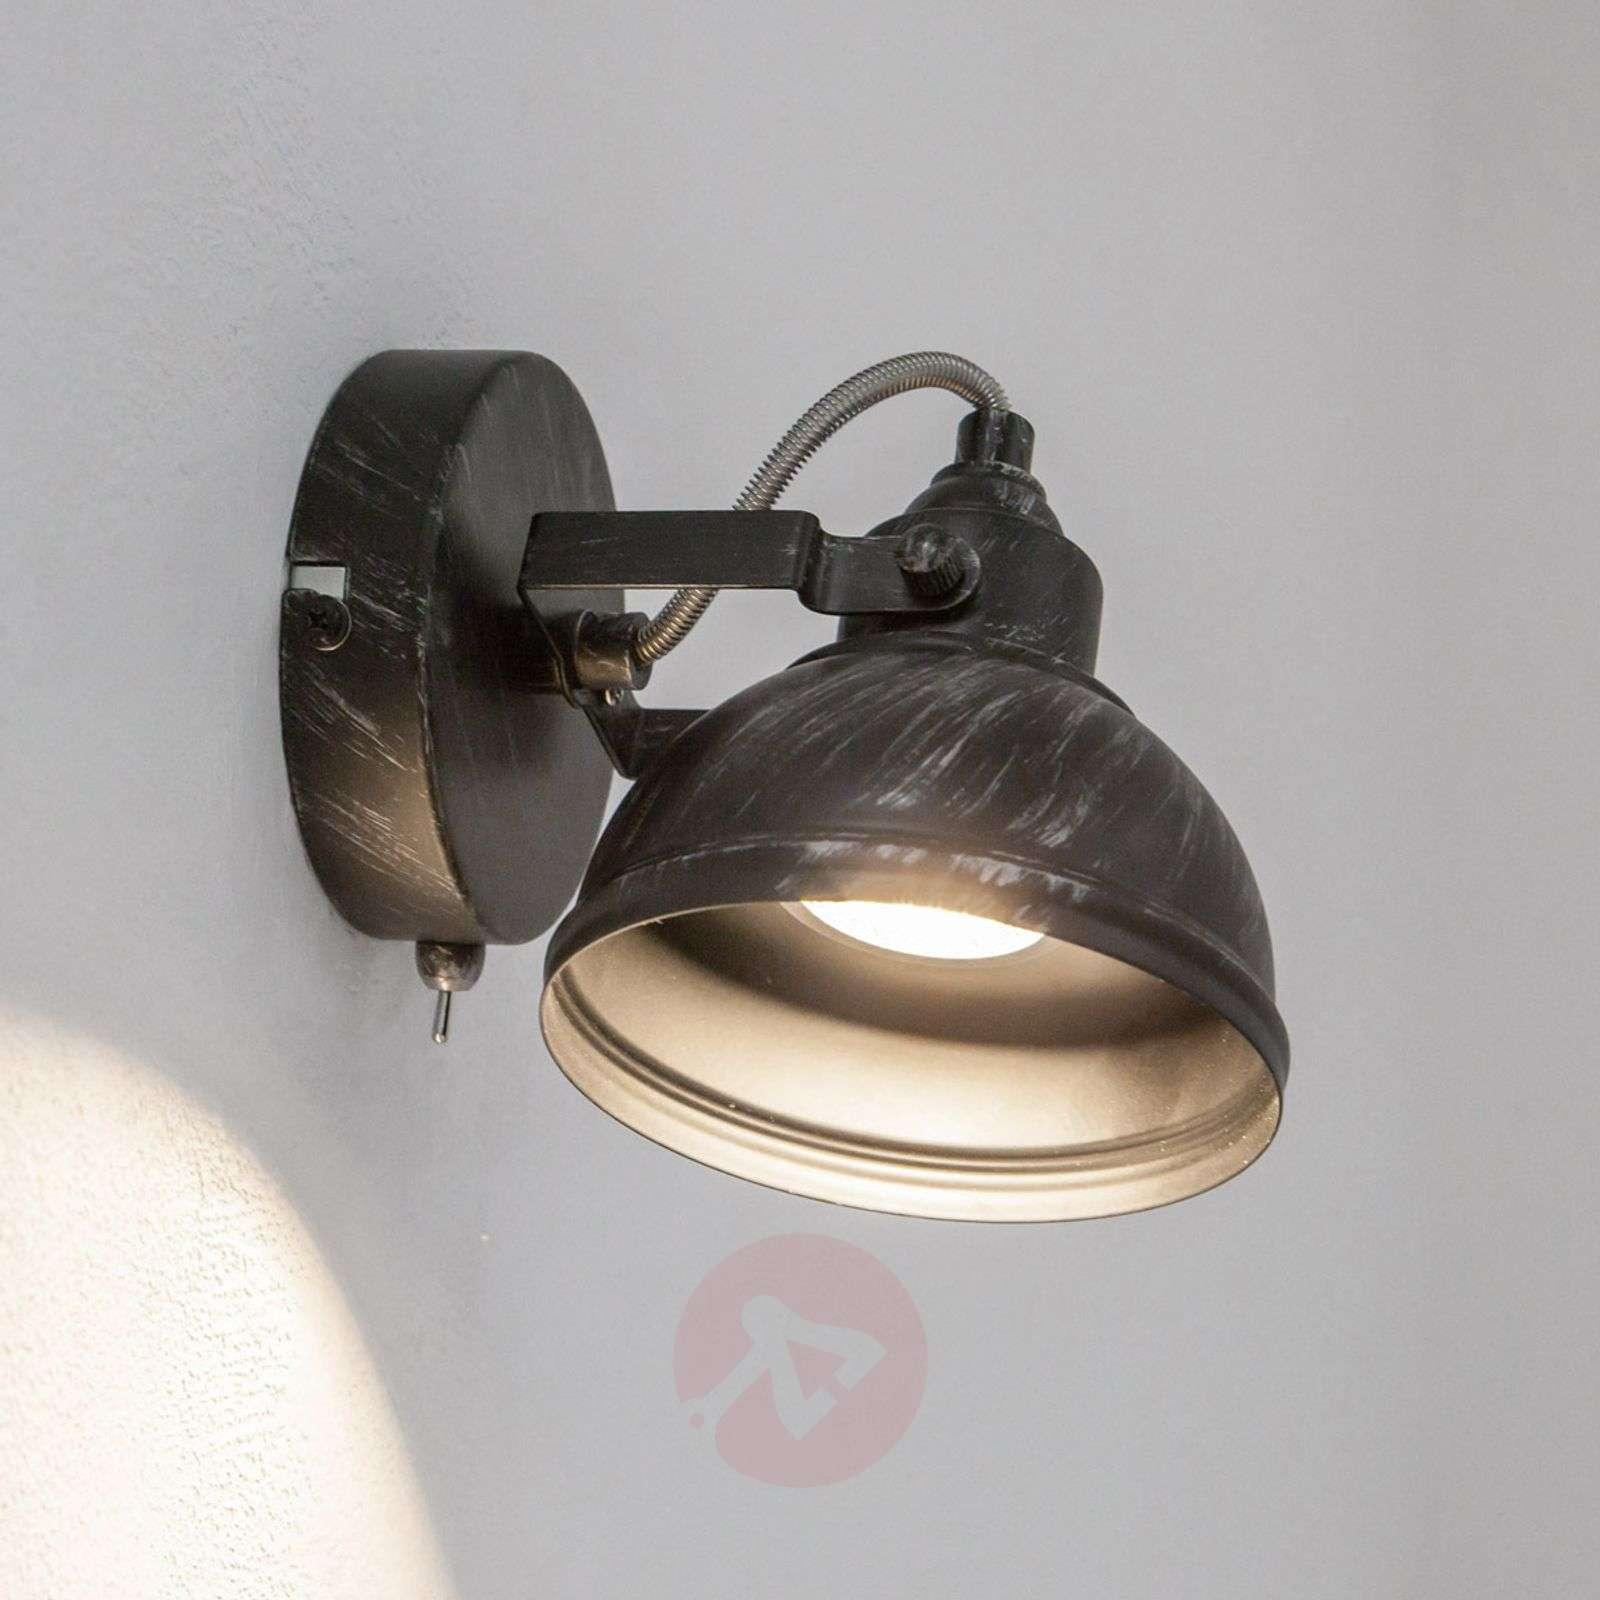 Antique-looking GU10 spotlight Etienne-9634019-010